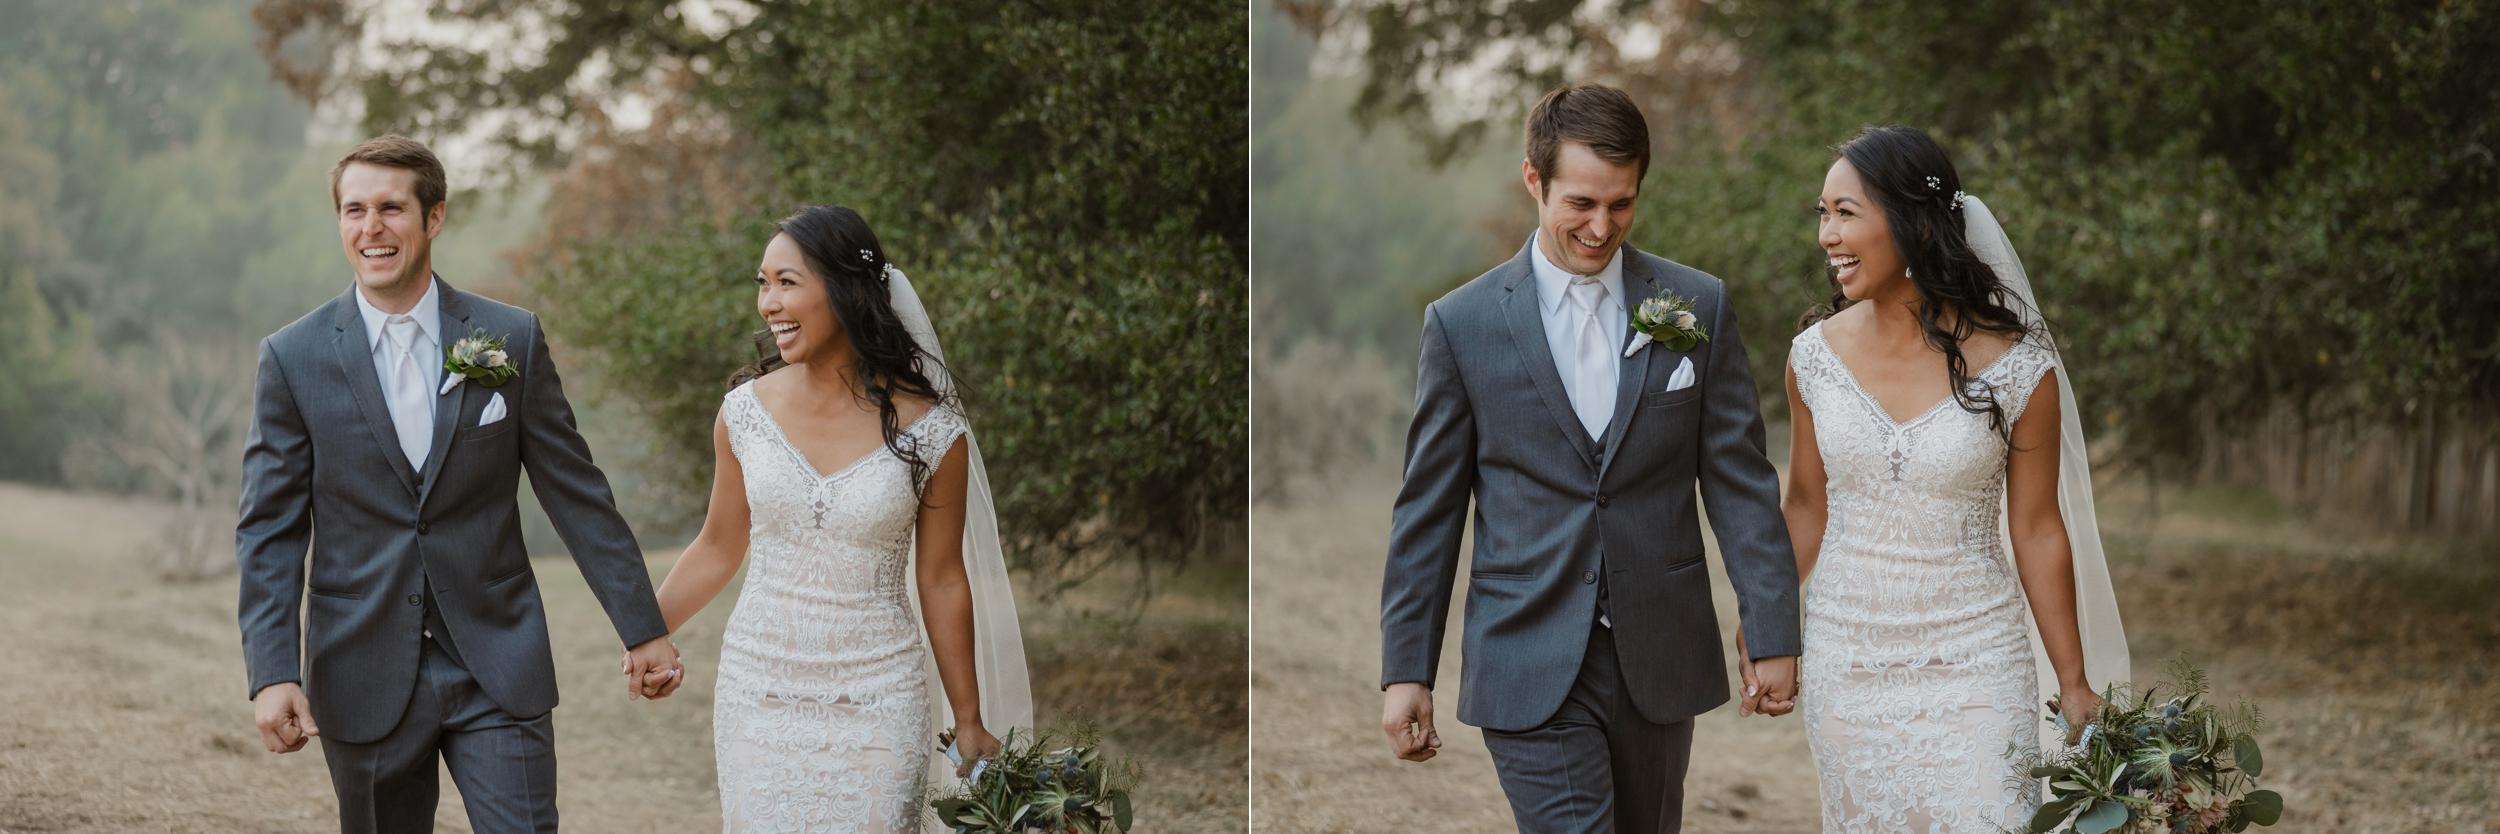 073marin-petaluma-backyard-wedding-vivianchen-474_WEB.jpg